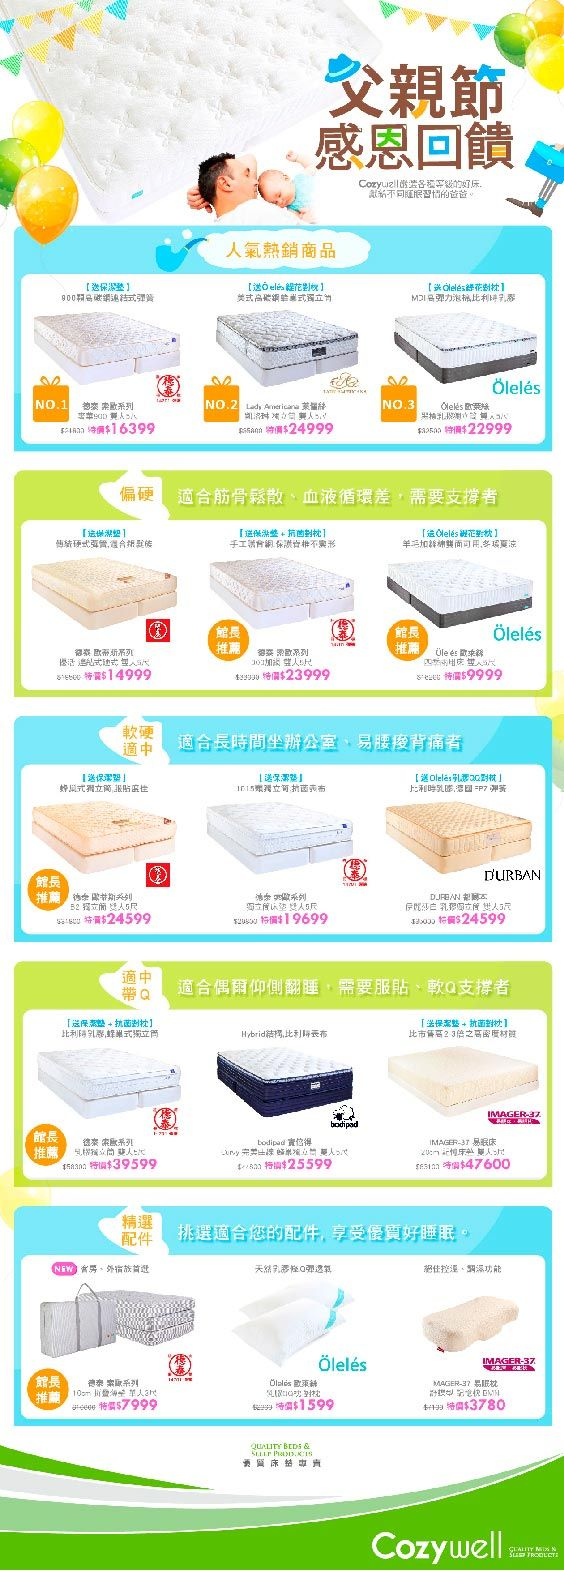 2017-06-mattress edm